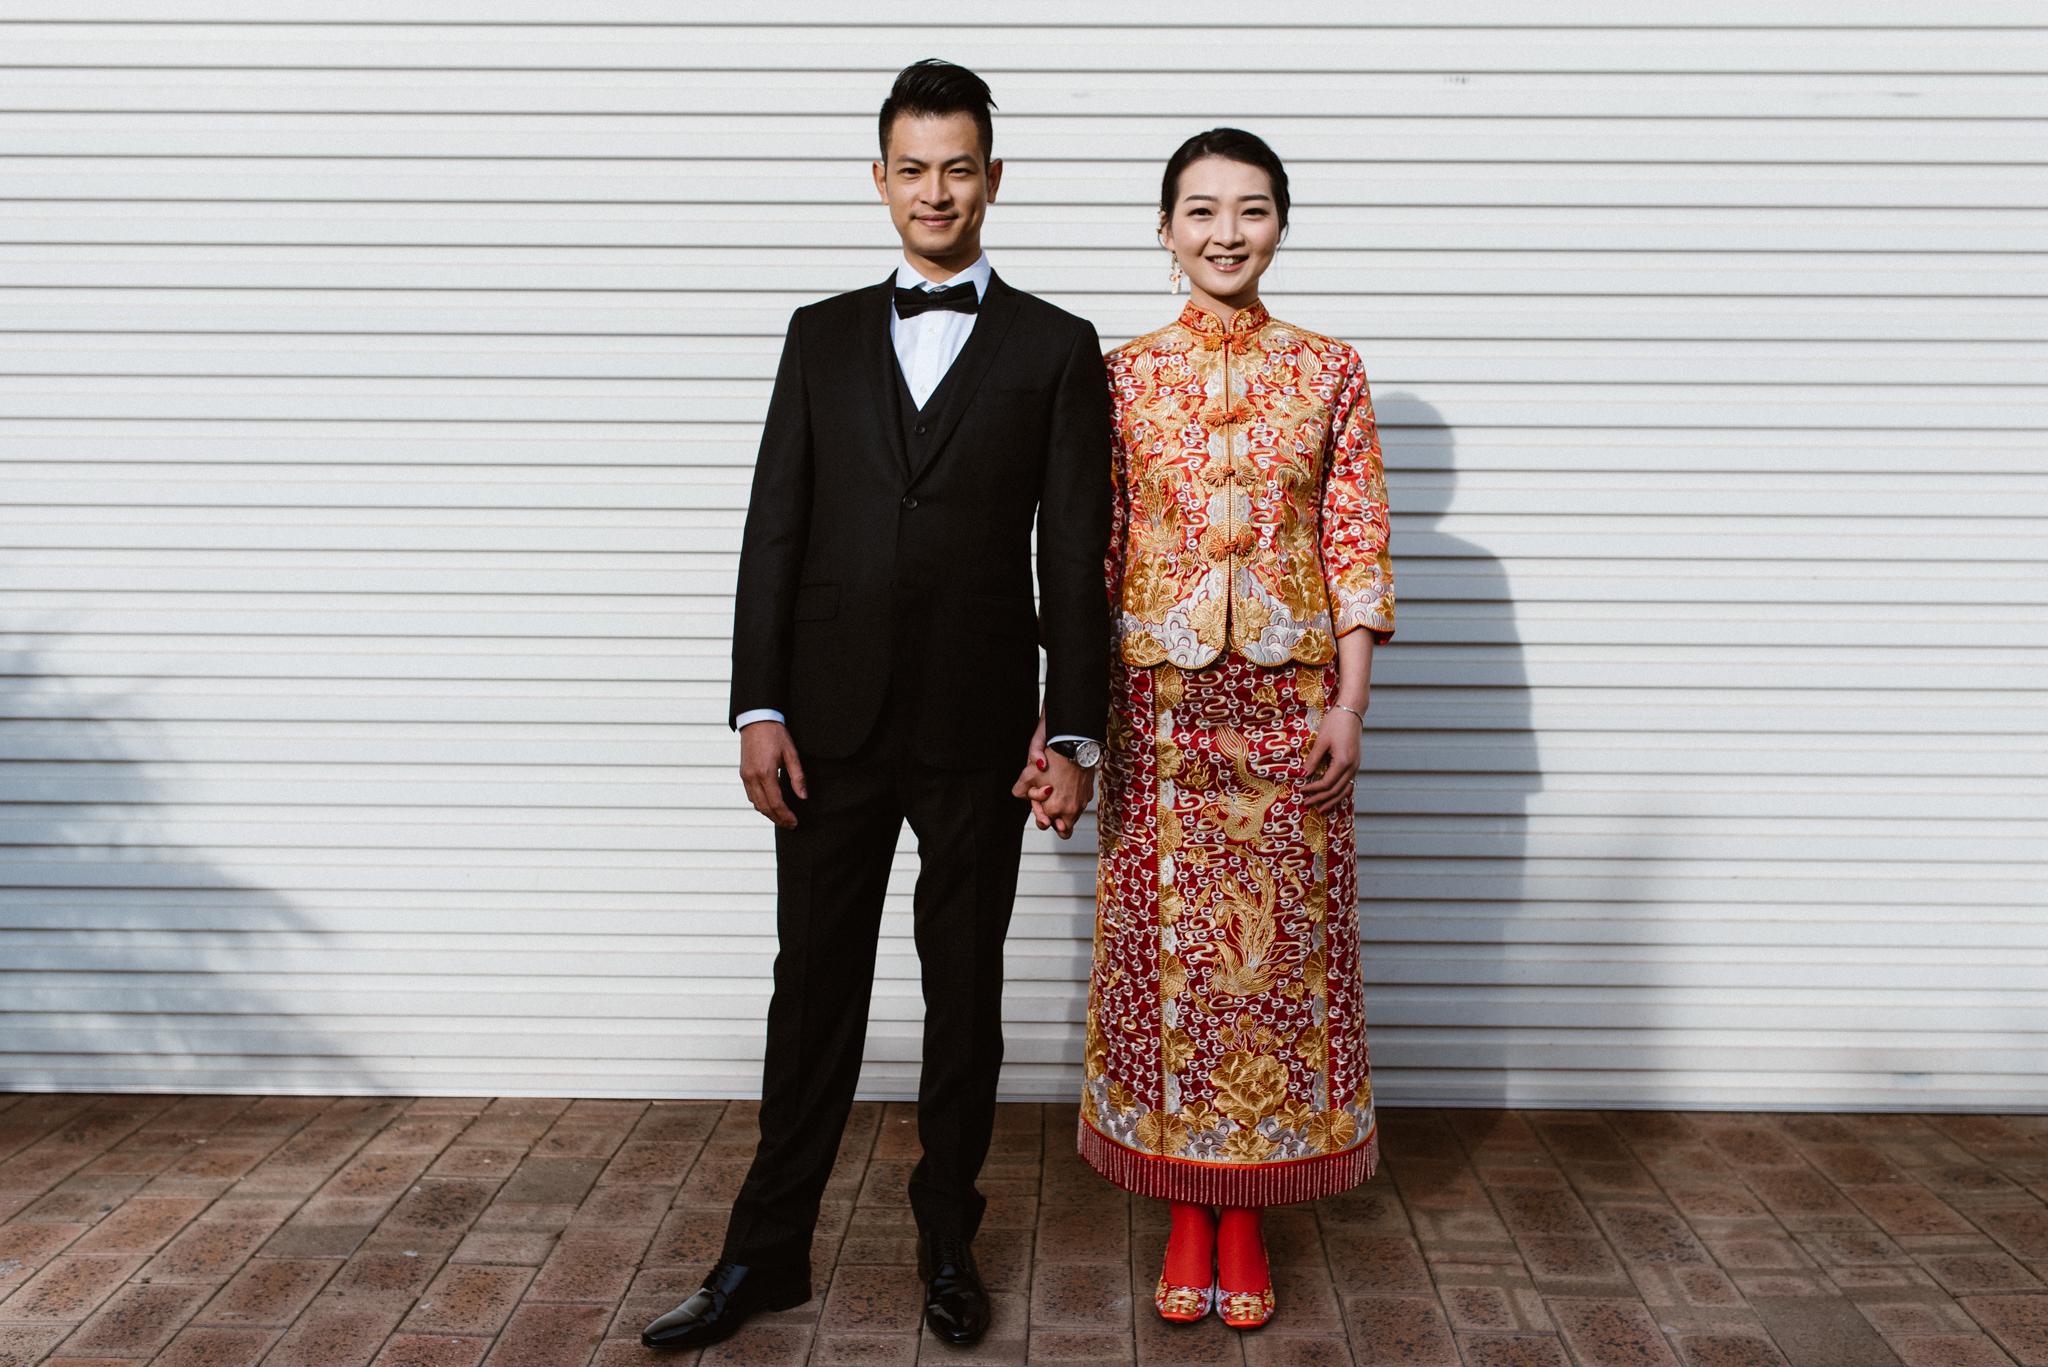 Caversham House and Dragon Palace Wedding - Z and Yanni - 100617 - Rachel Puan Photography-0055